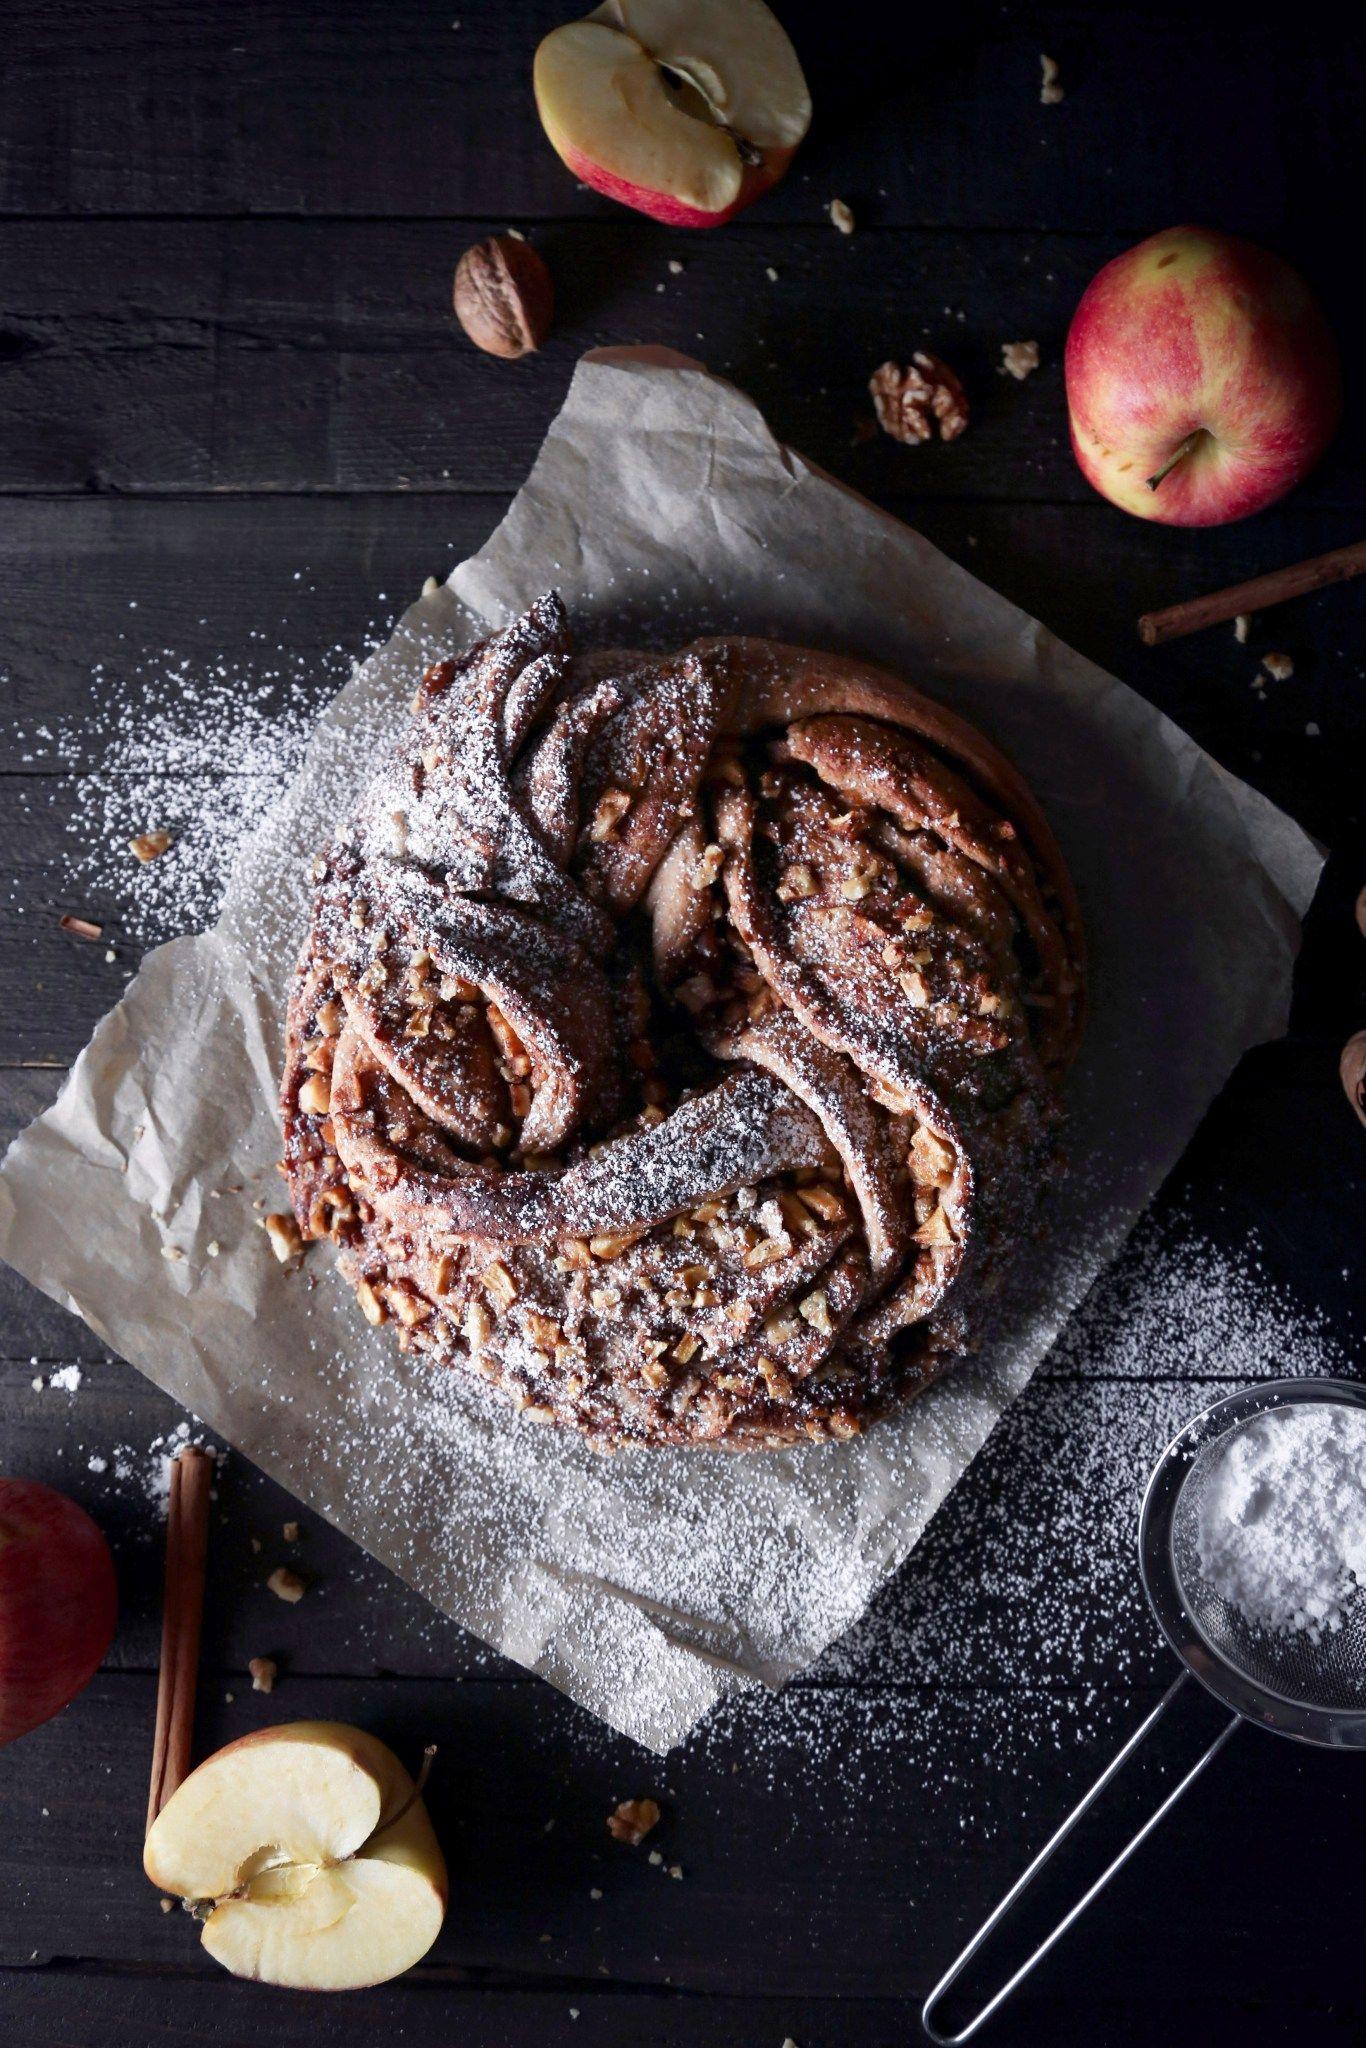 Braided Apple Walnut Bread | Free of dairy, eggs, and refined sugar. Vegan friendly.